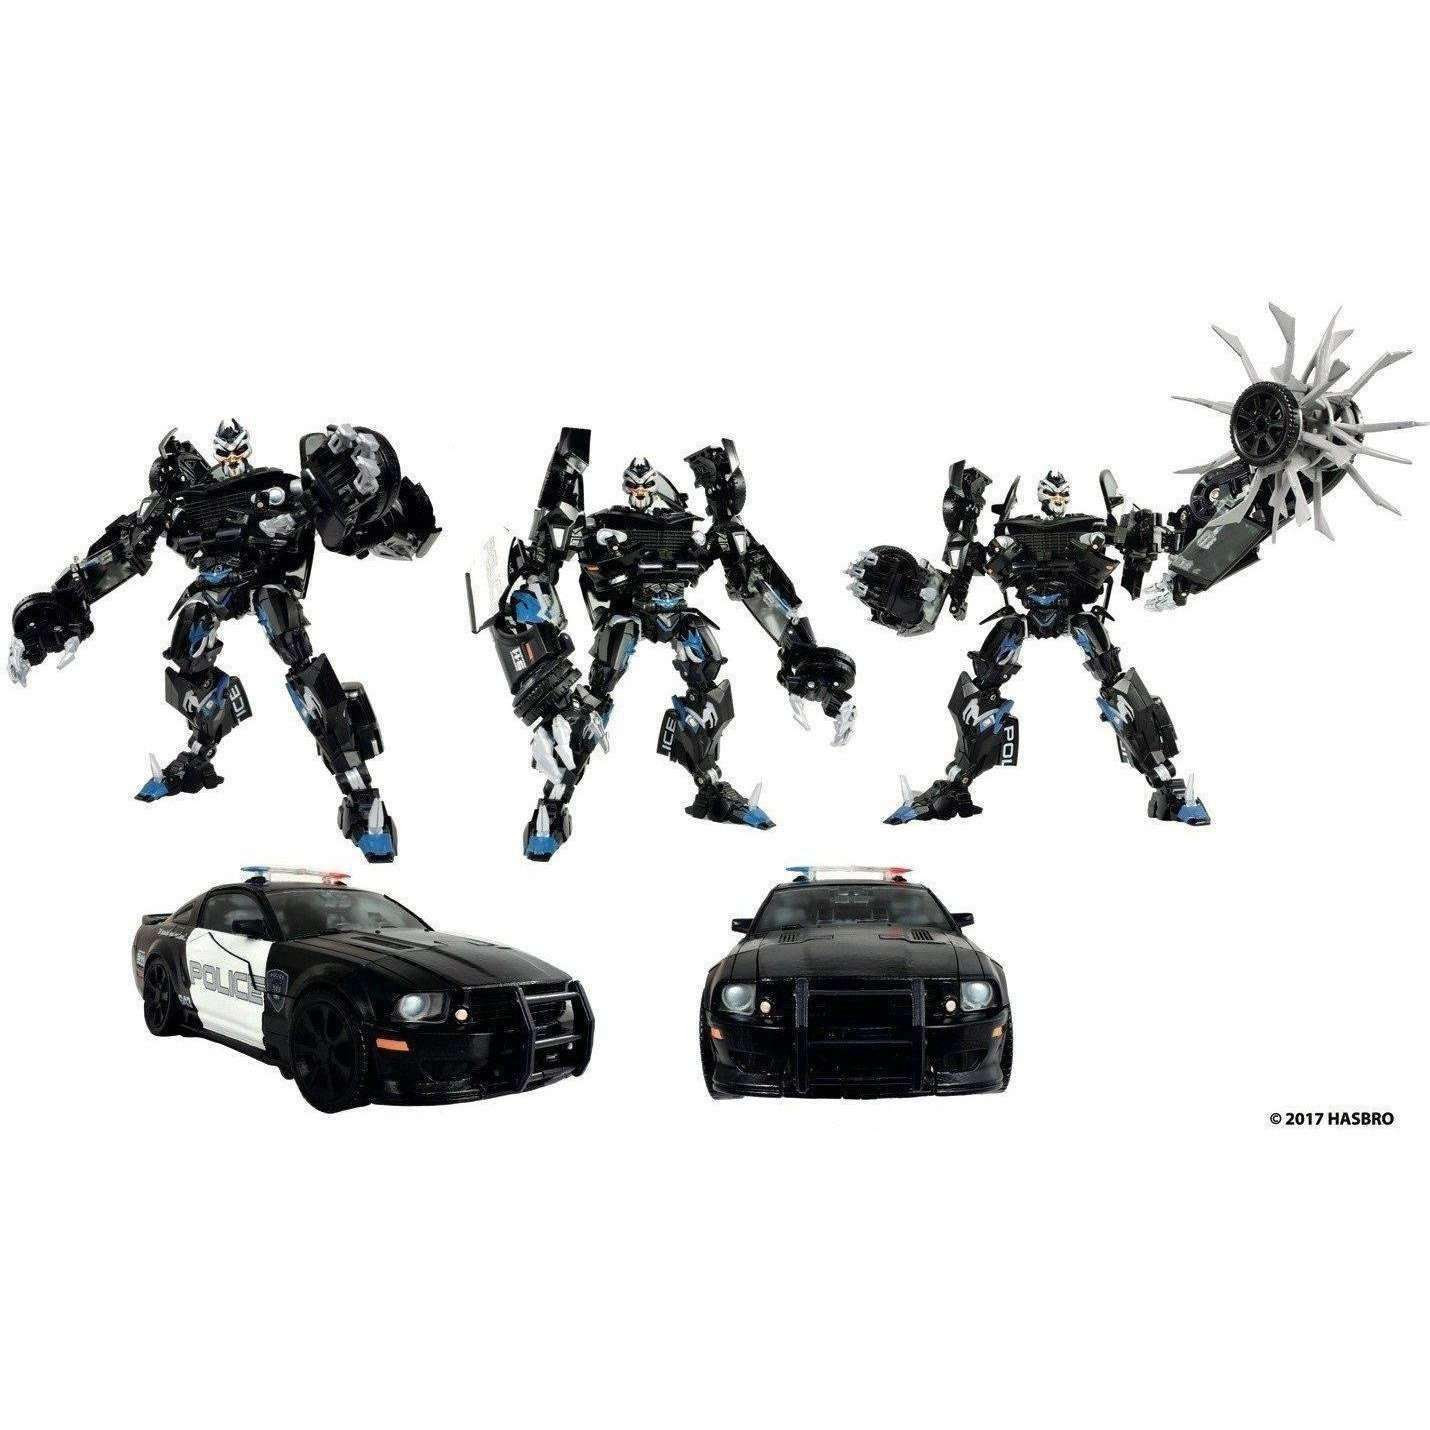 Image of Transformers Masterpiece - Movie Series - MPM-5 Decepticon Barricade